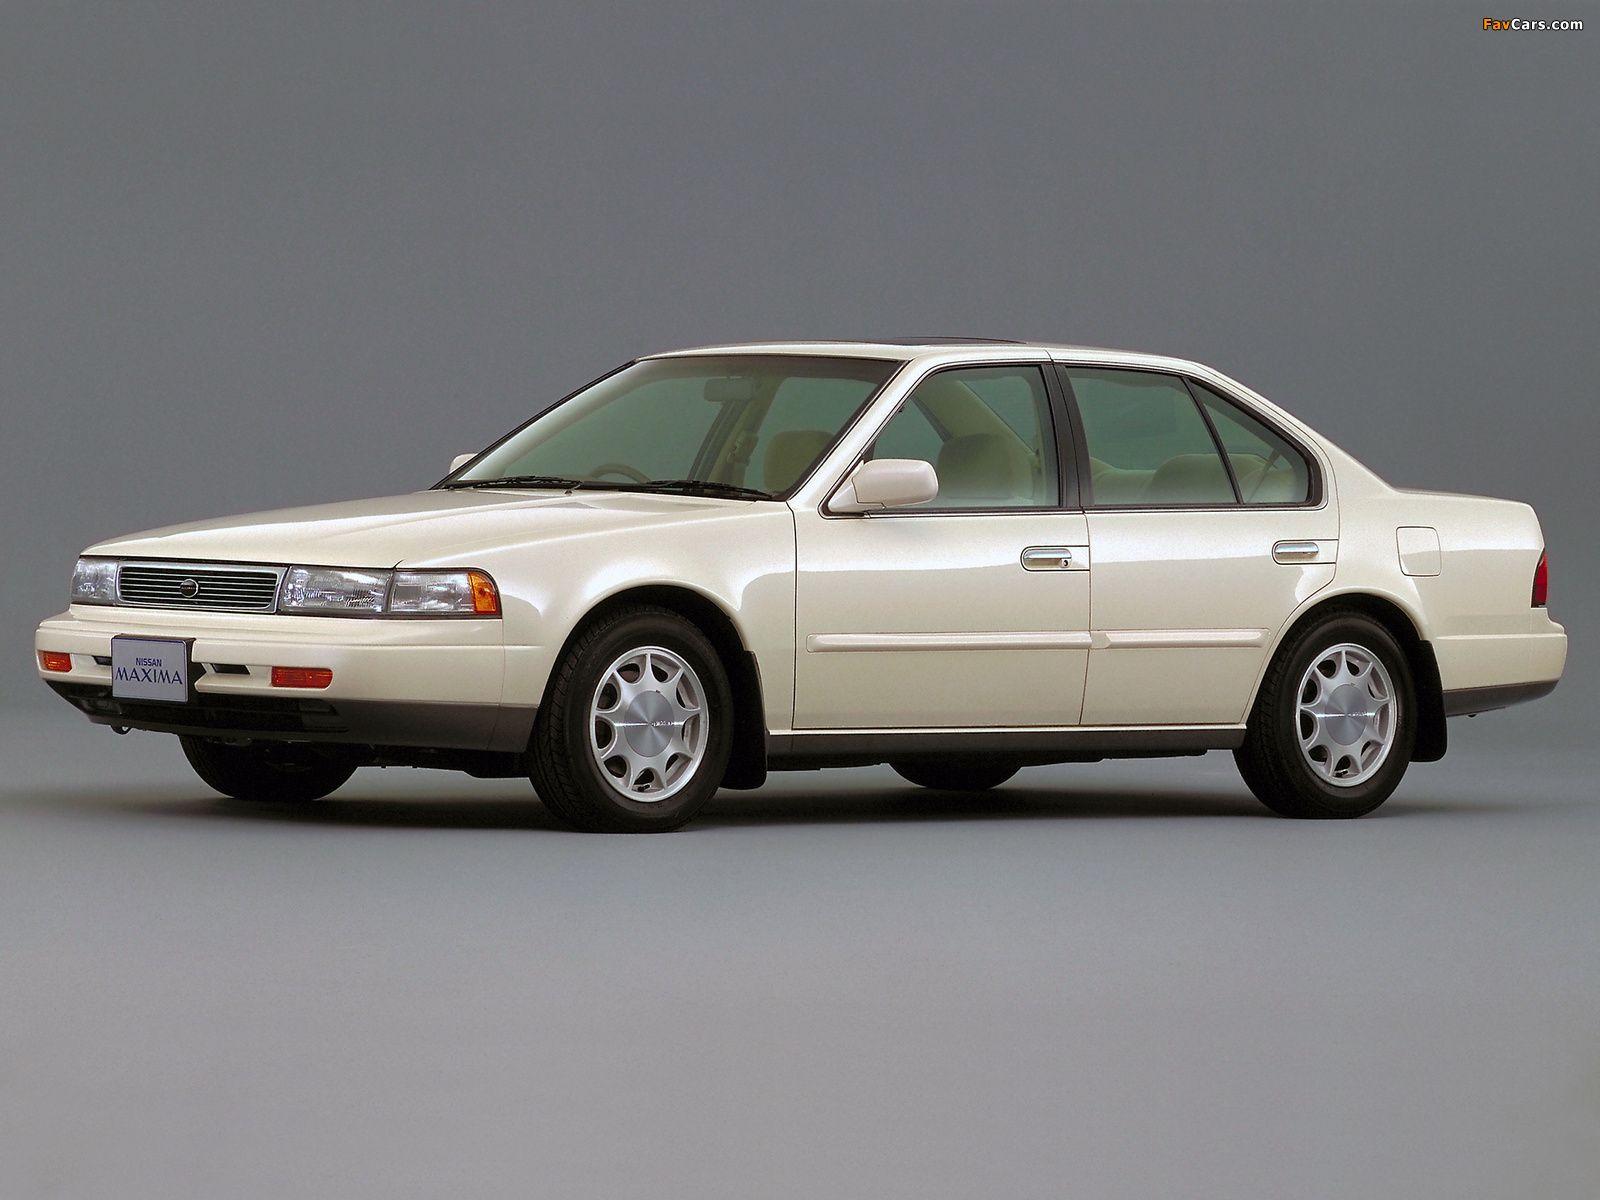 4dsc Nissan Maxima Nissan Nissan Altima Coupe